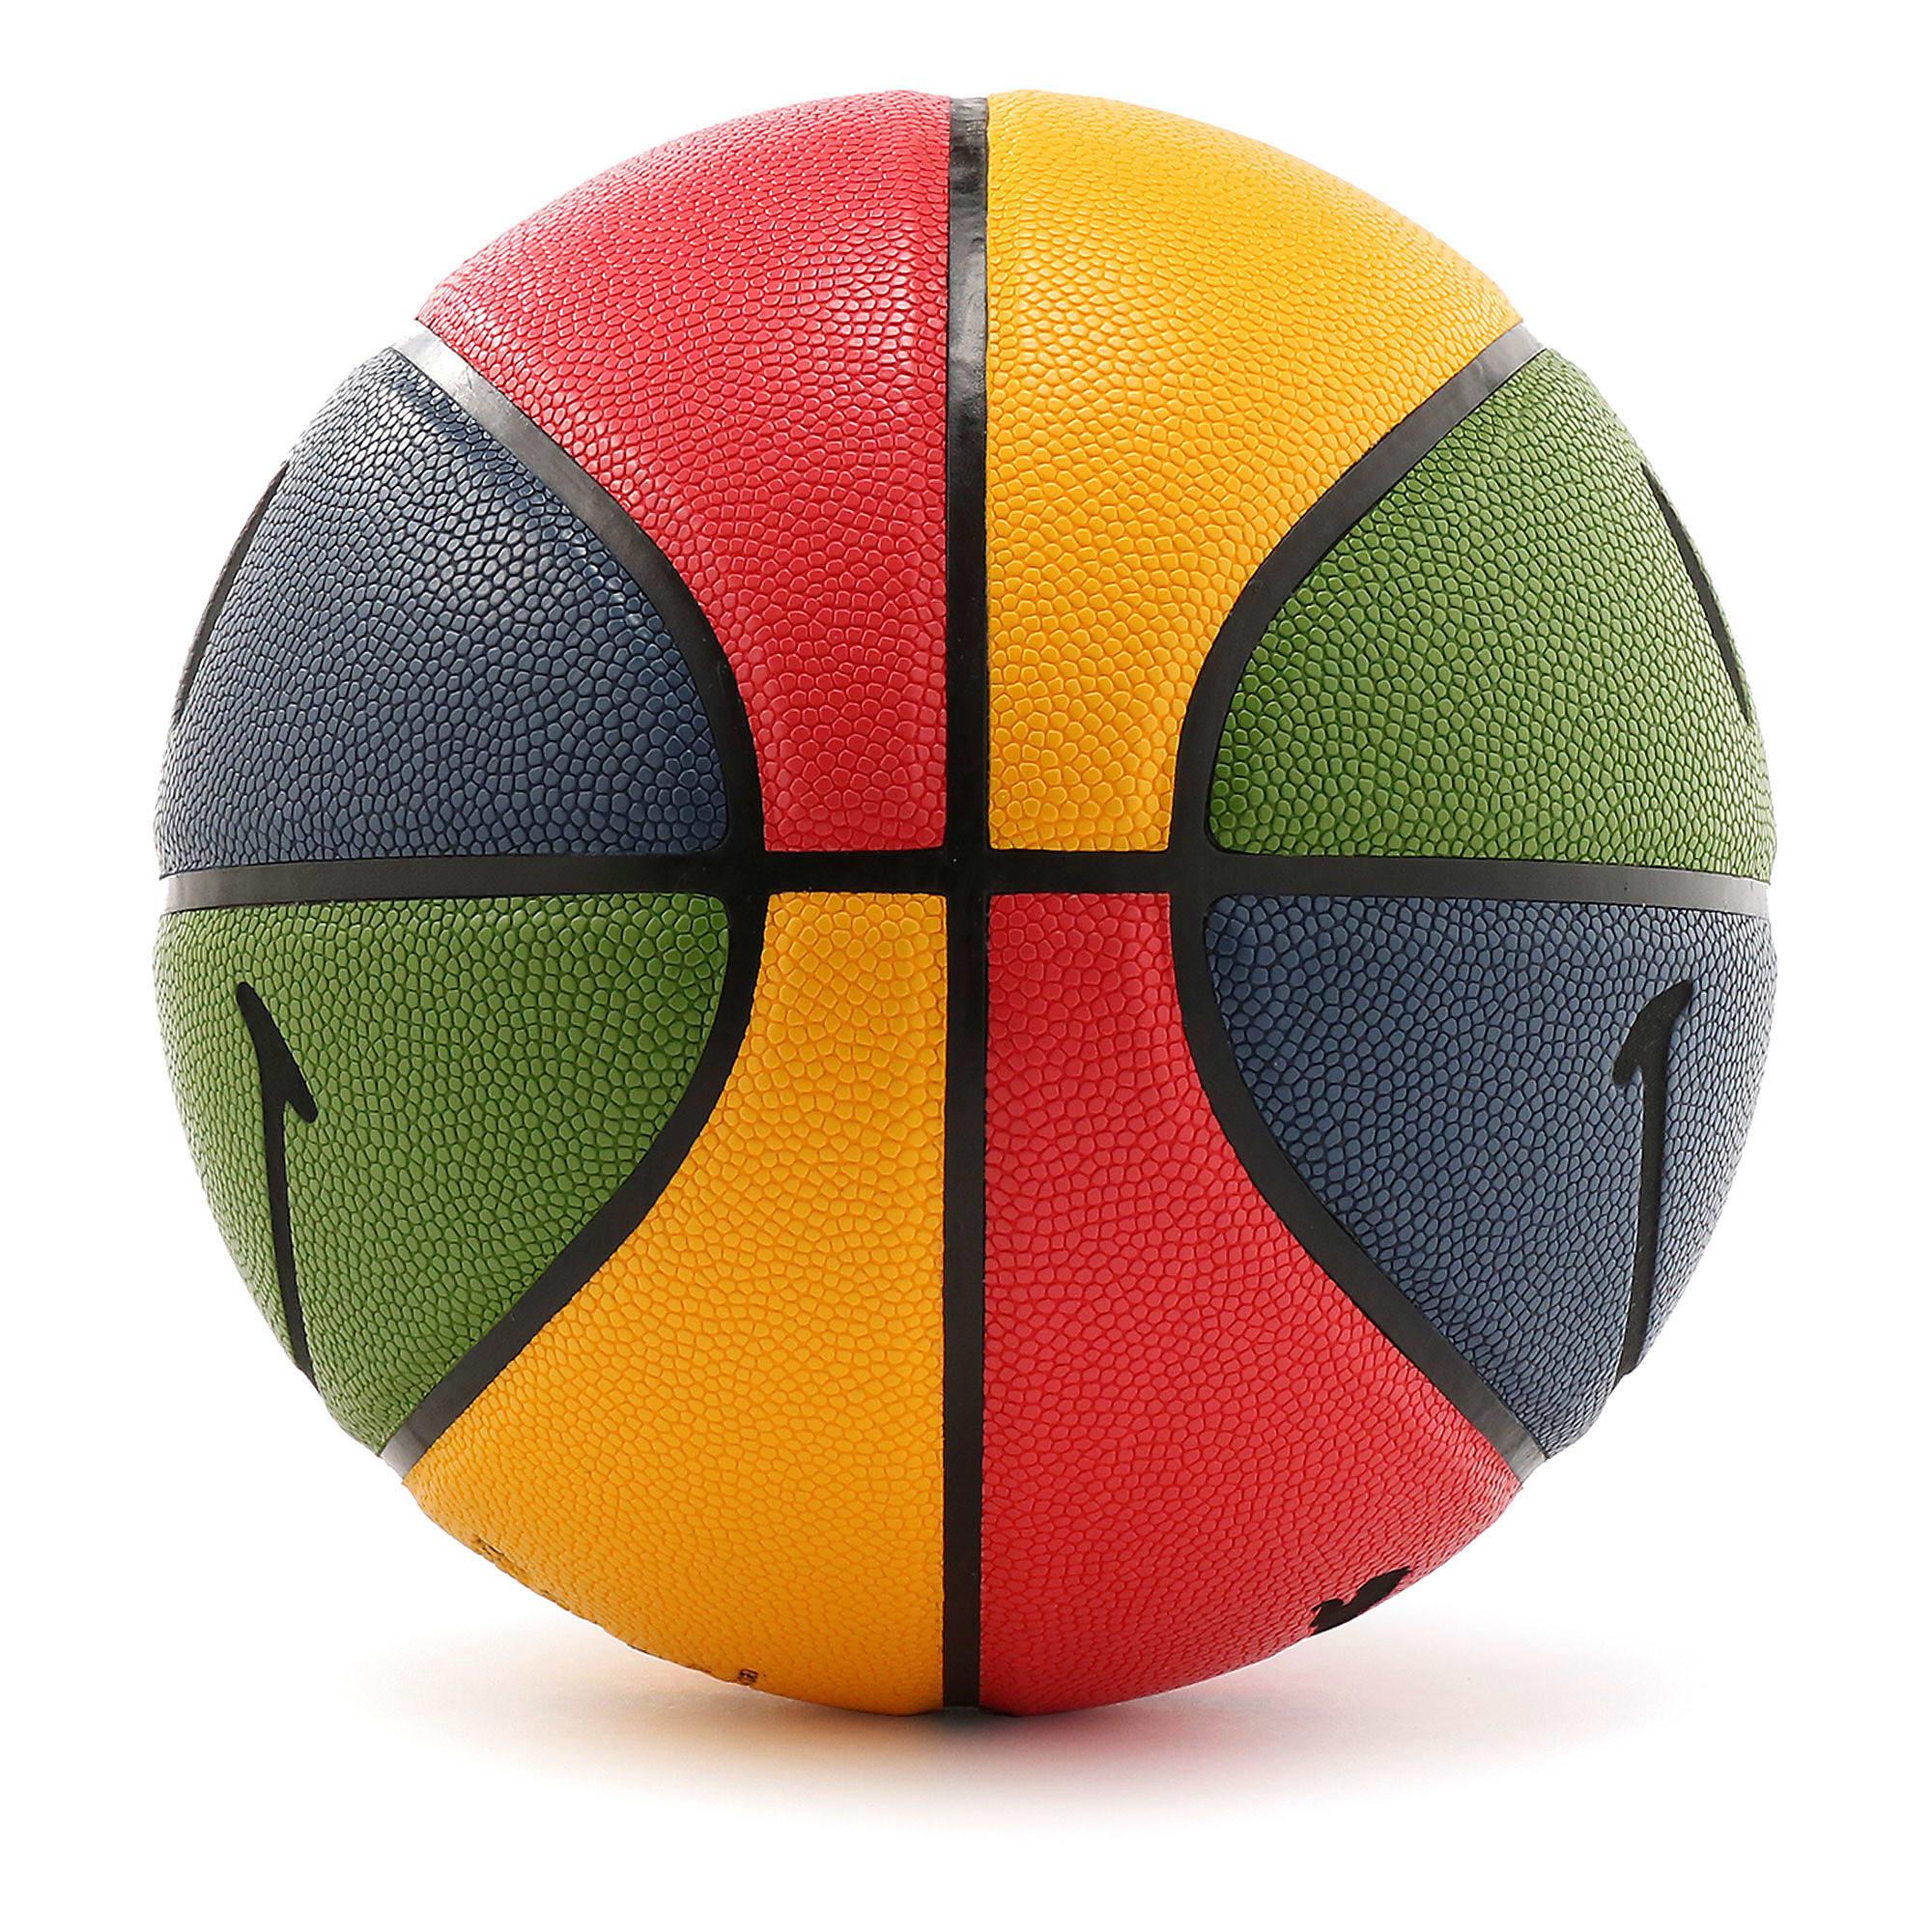 Thumbnail 3 of PUMA x CHINATOWN MARKET バスケットボール, Multi, medium-JPN